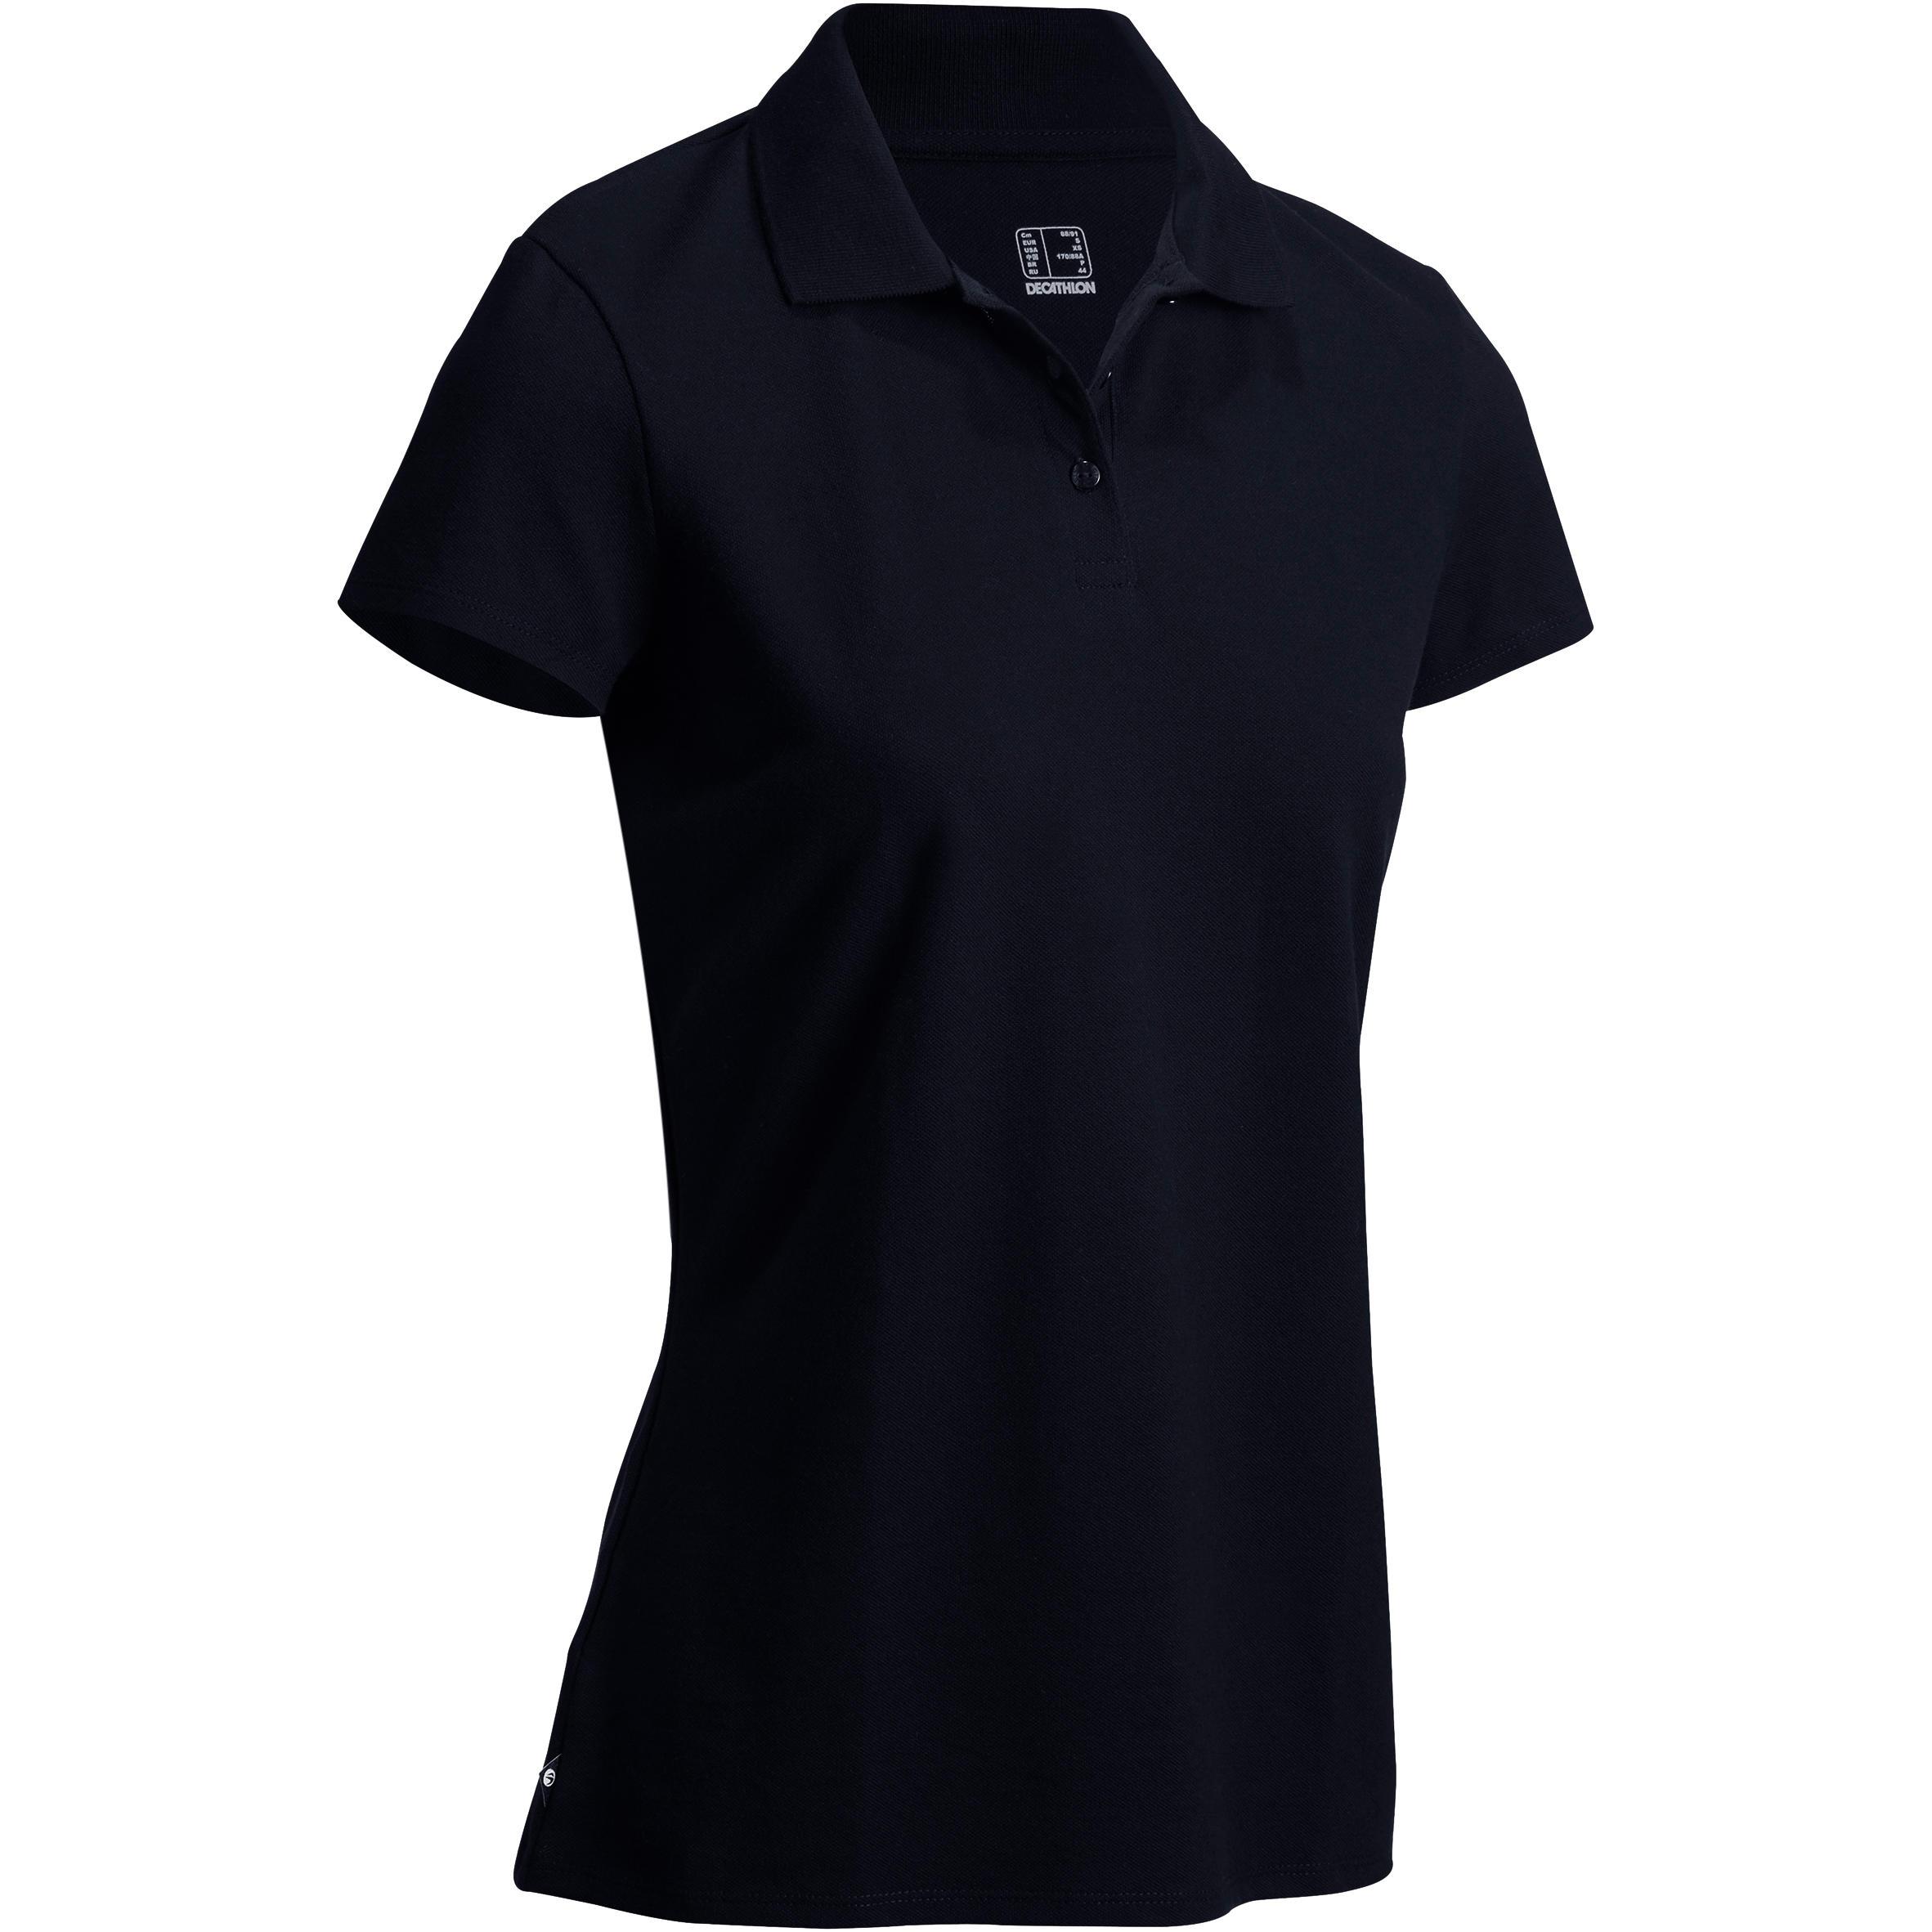 Golf Wanita Polo 100 - Hitam